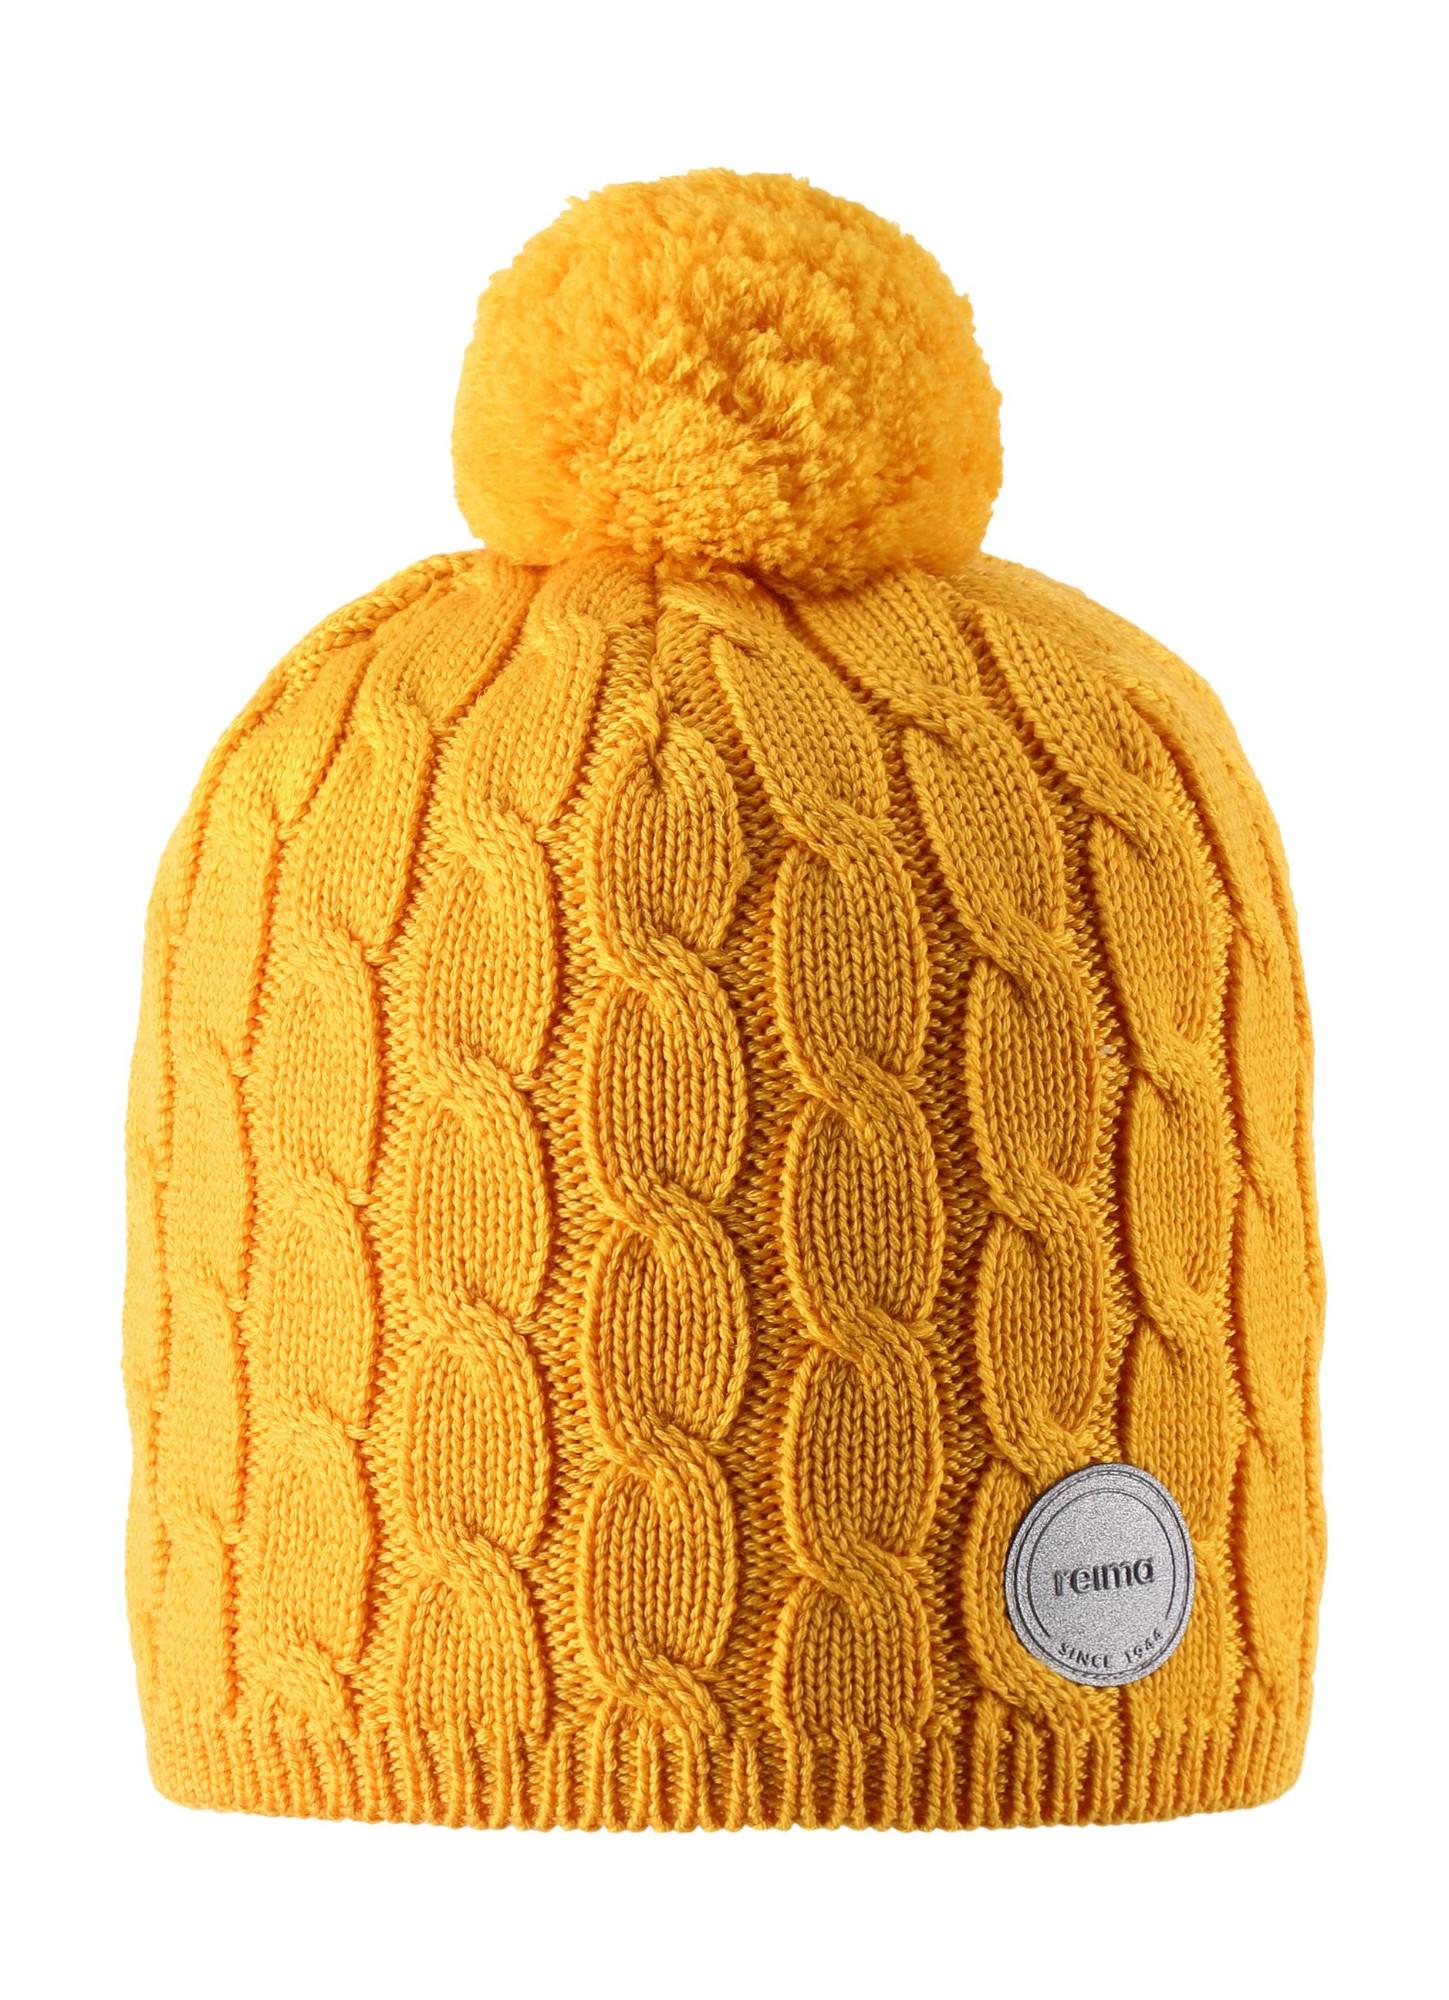 REIMA Nyksund Warm Yellow 52-54